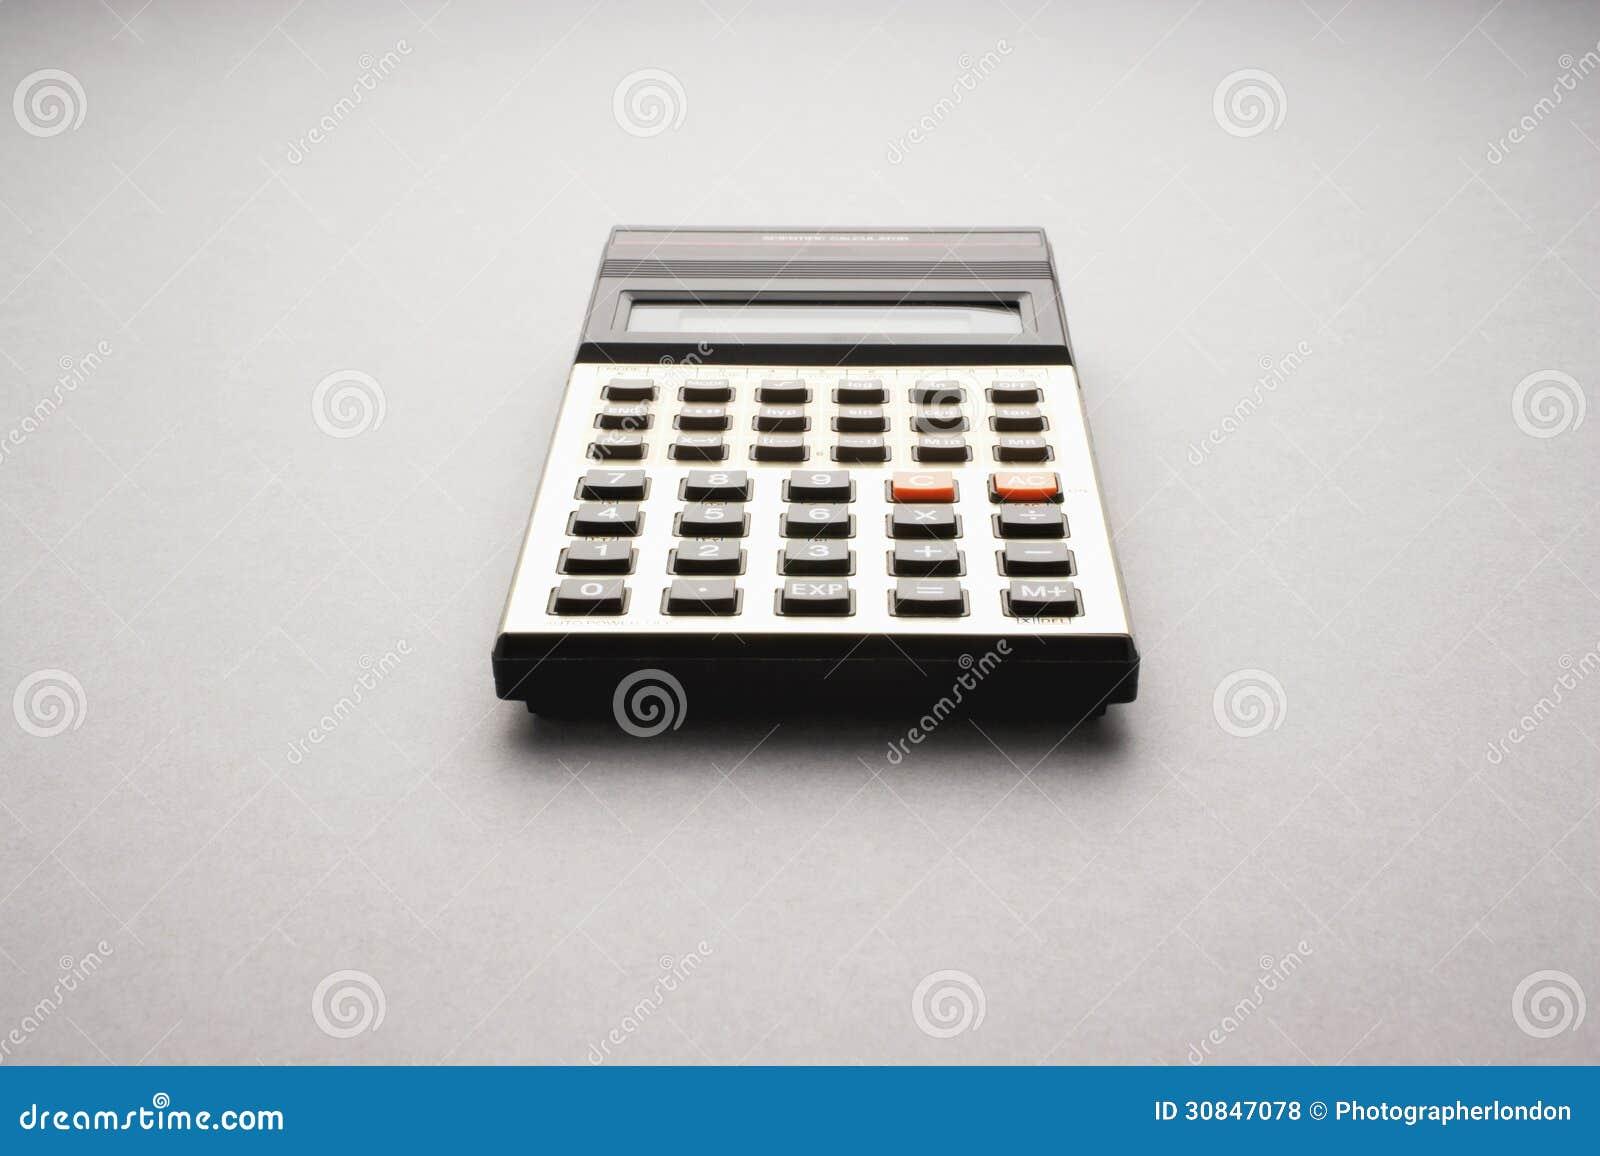 Vintage Calculators Web Museum 70